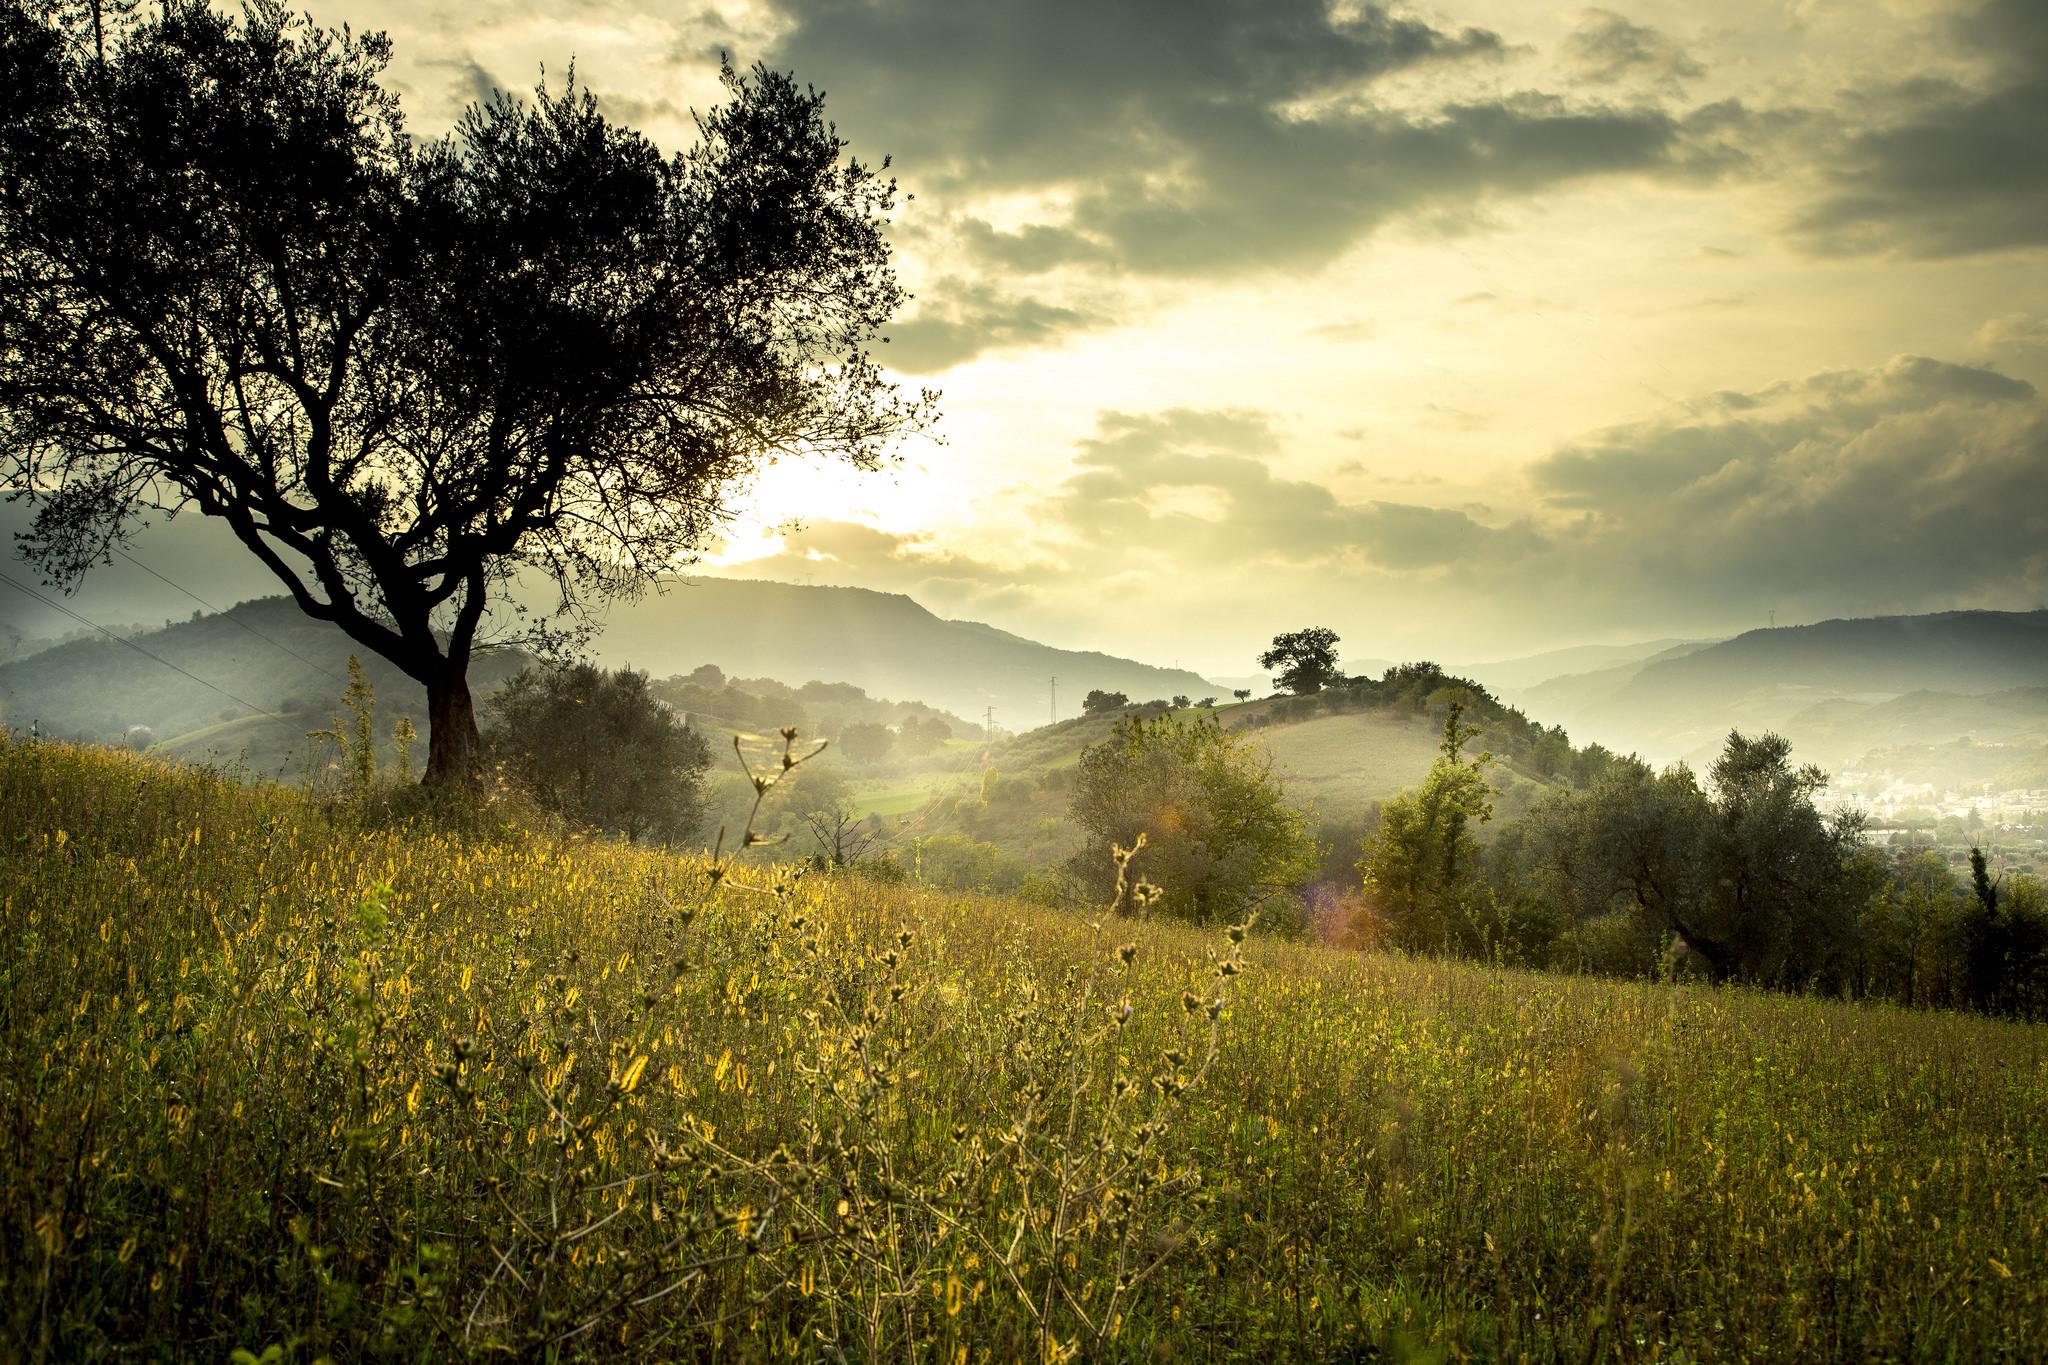 Improving Photography Skills Landscape Images Phowd